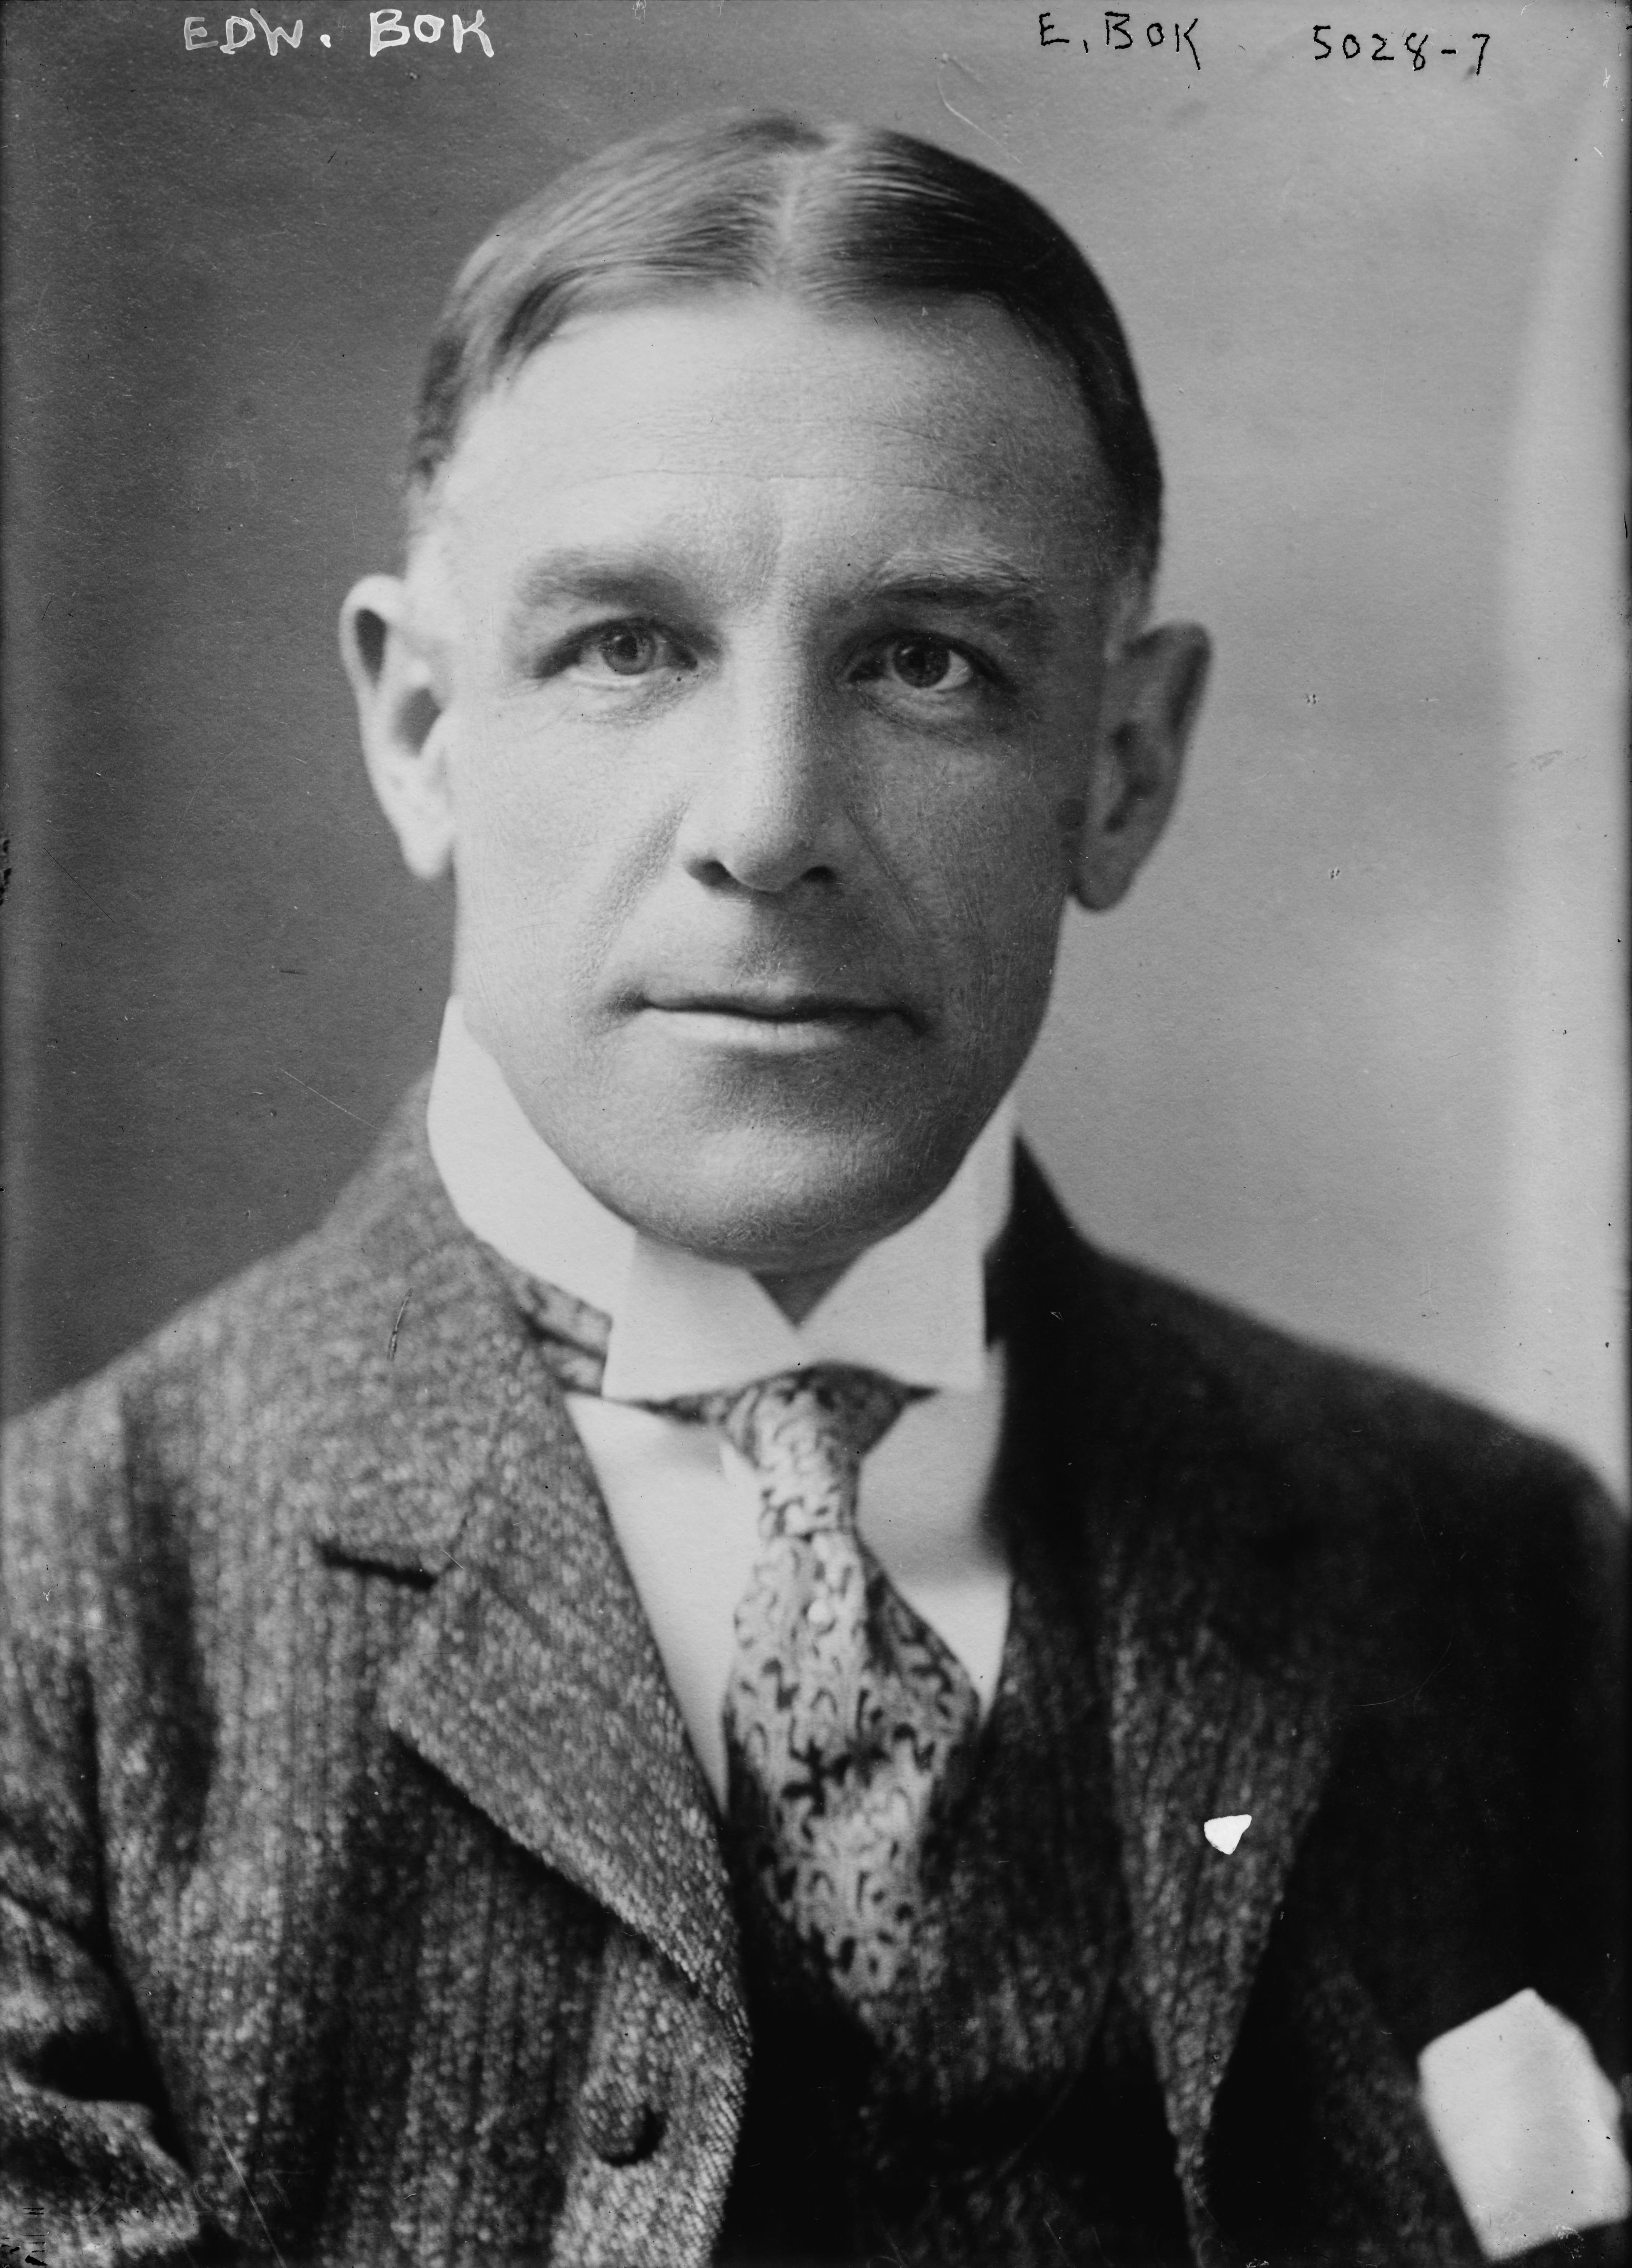 Edward Bok - Wikipedia